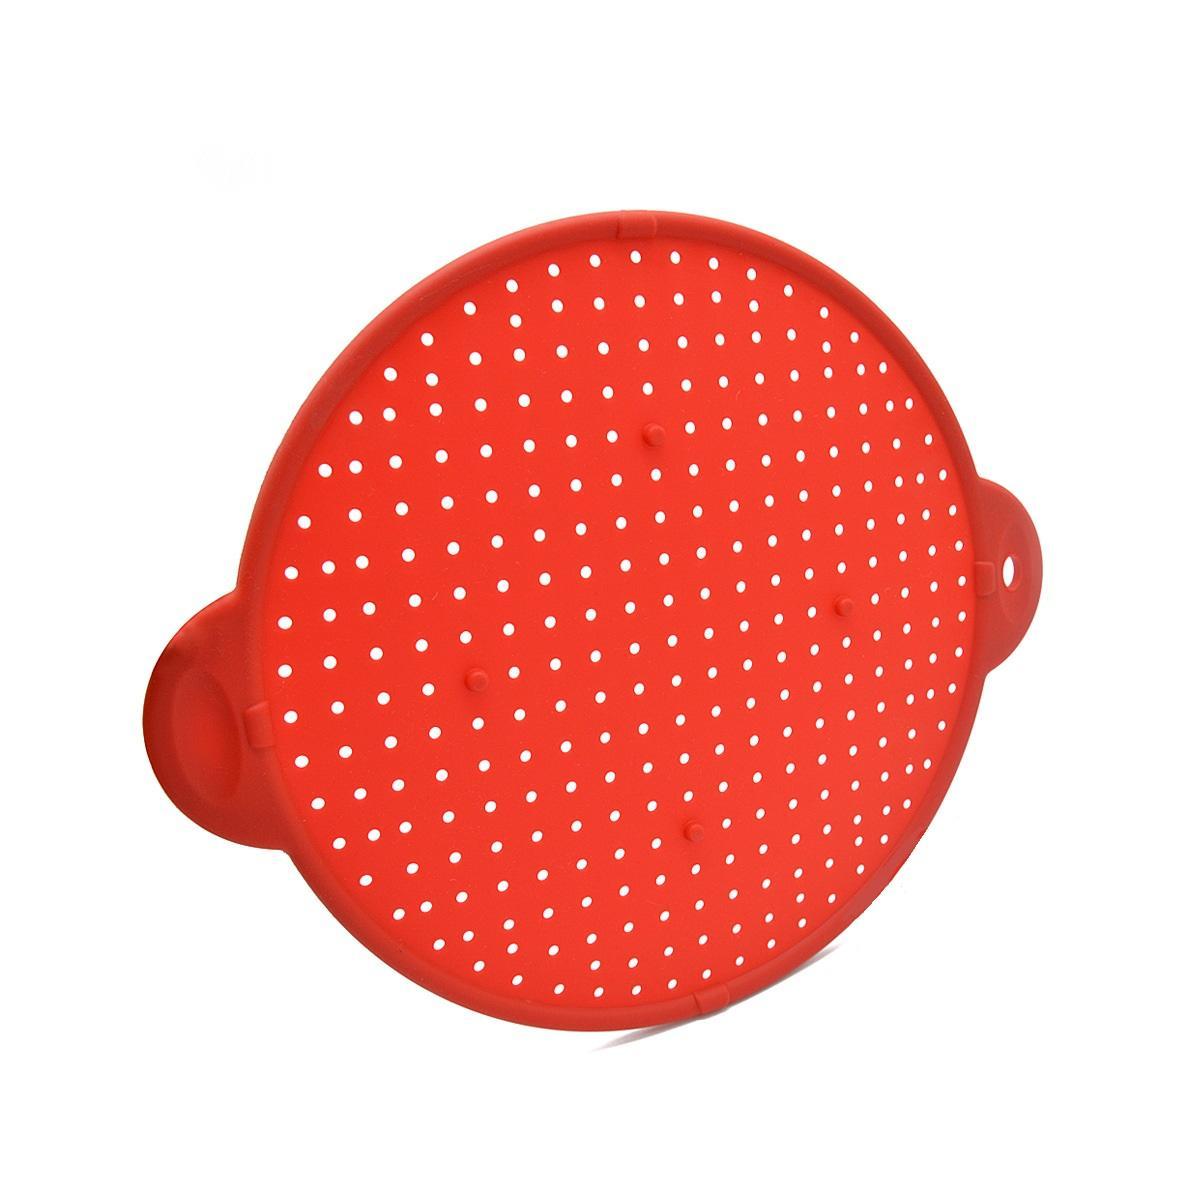 Multifunctional BPA Free silicone kitchen clip on strainer vegetables food fruit Colander